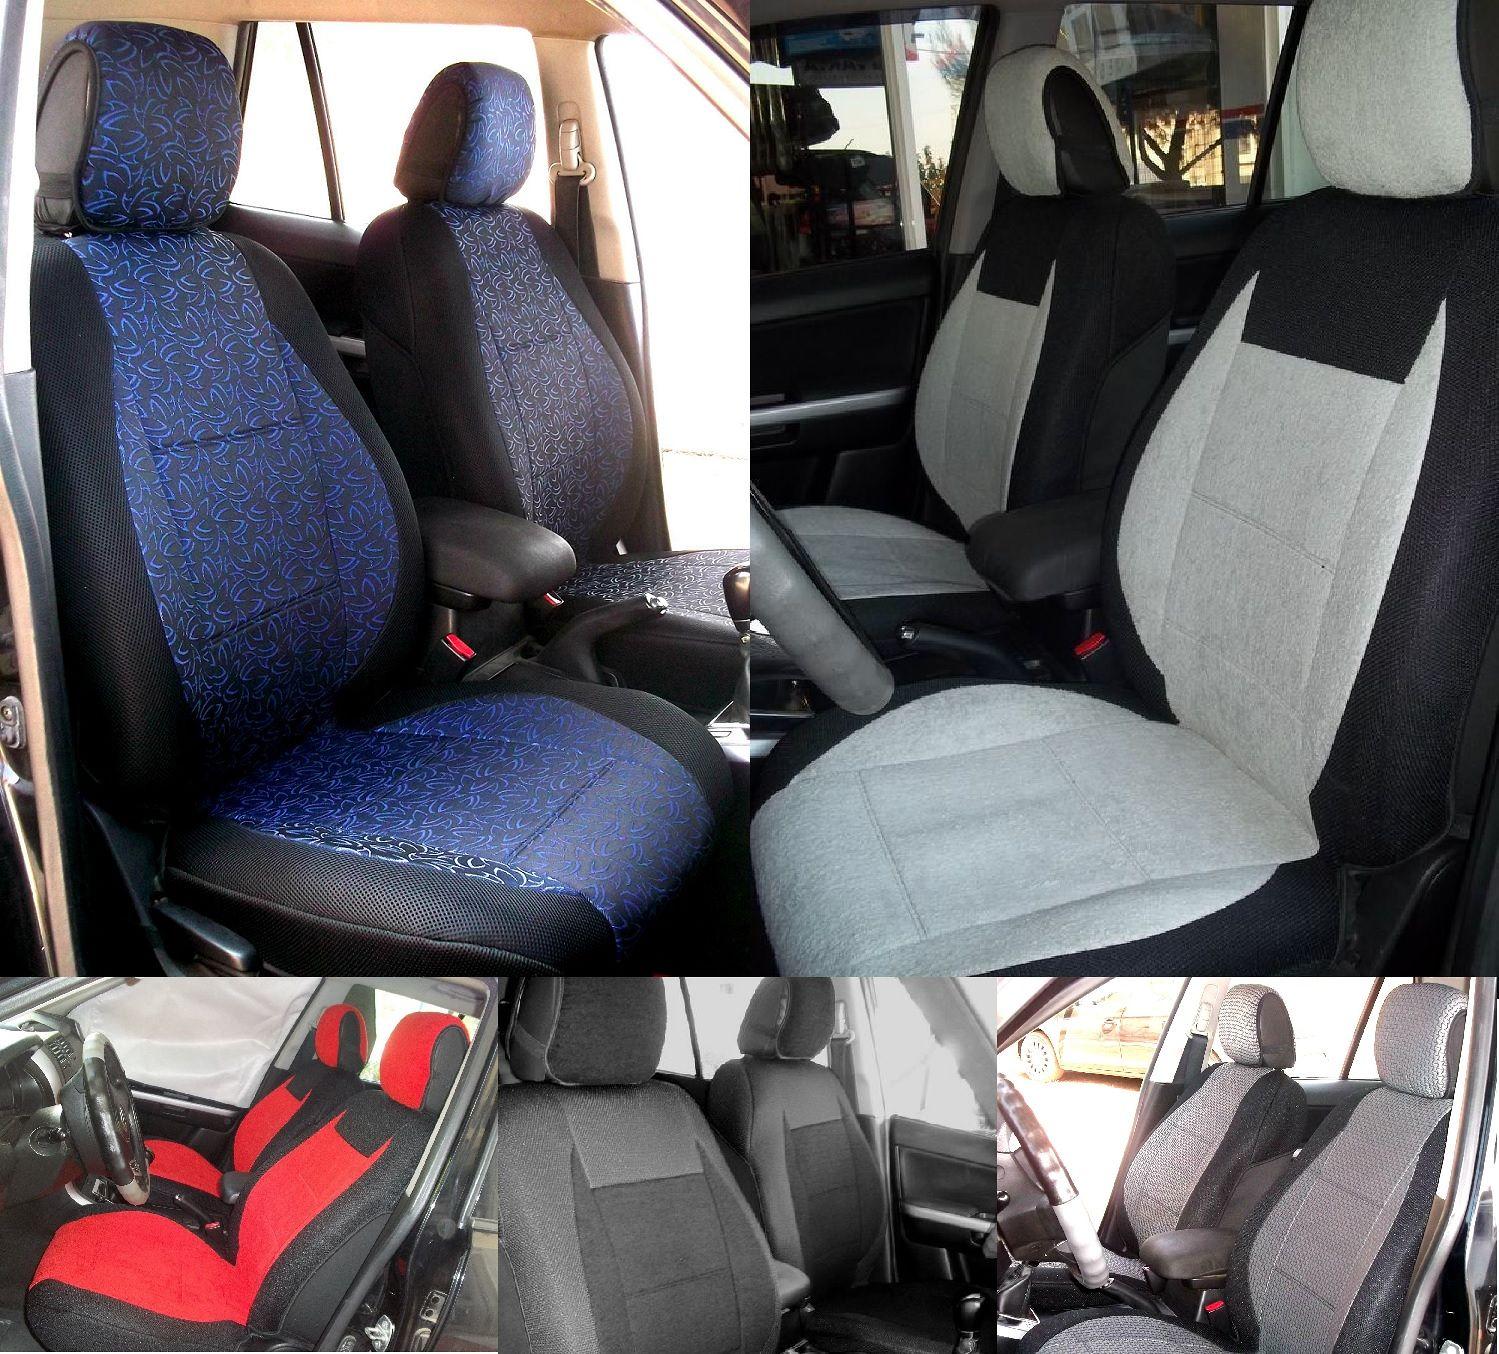 high quality custom car seat covers for subaru crosstrek. Black Bedroom Furniture Sets. Home Design Ideas